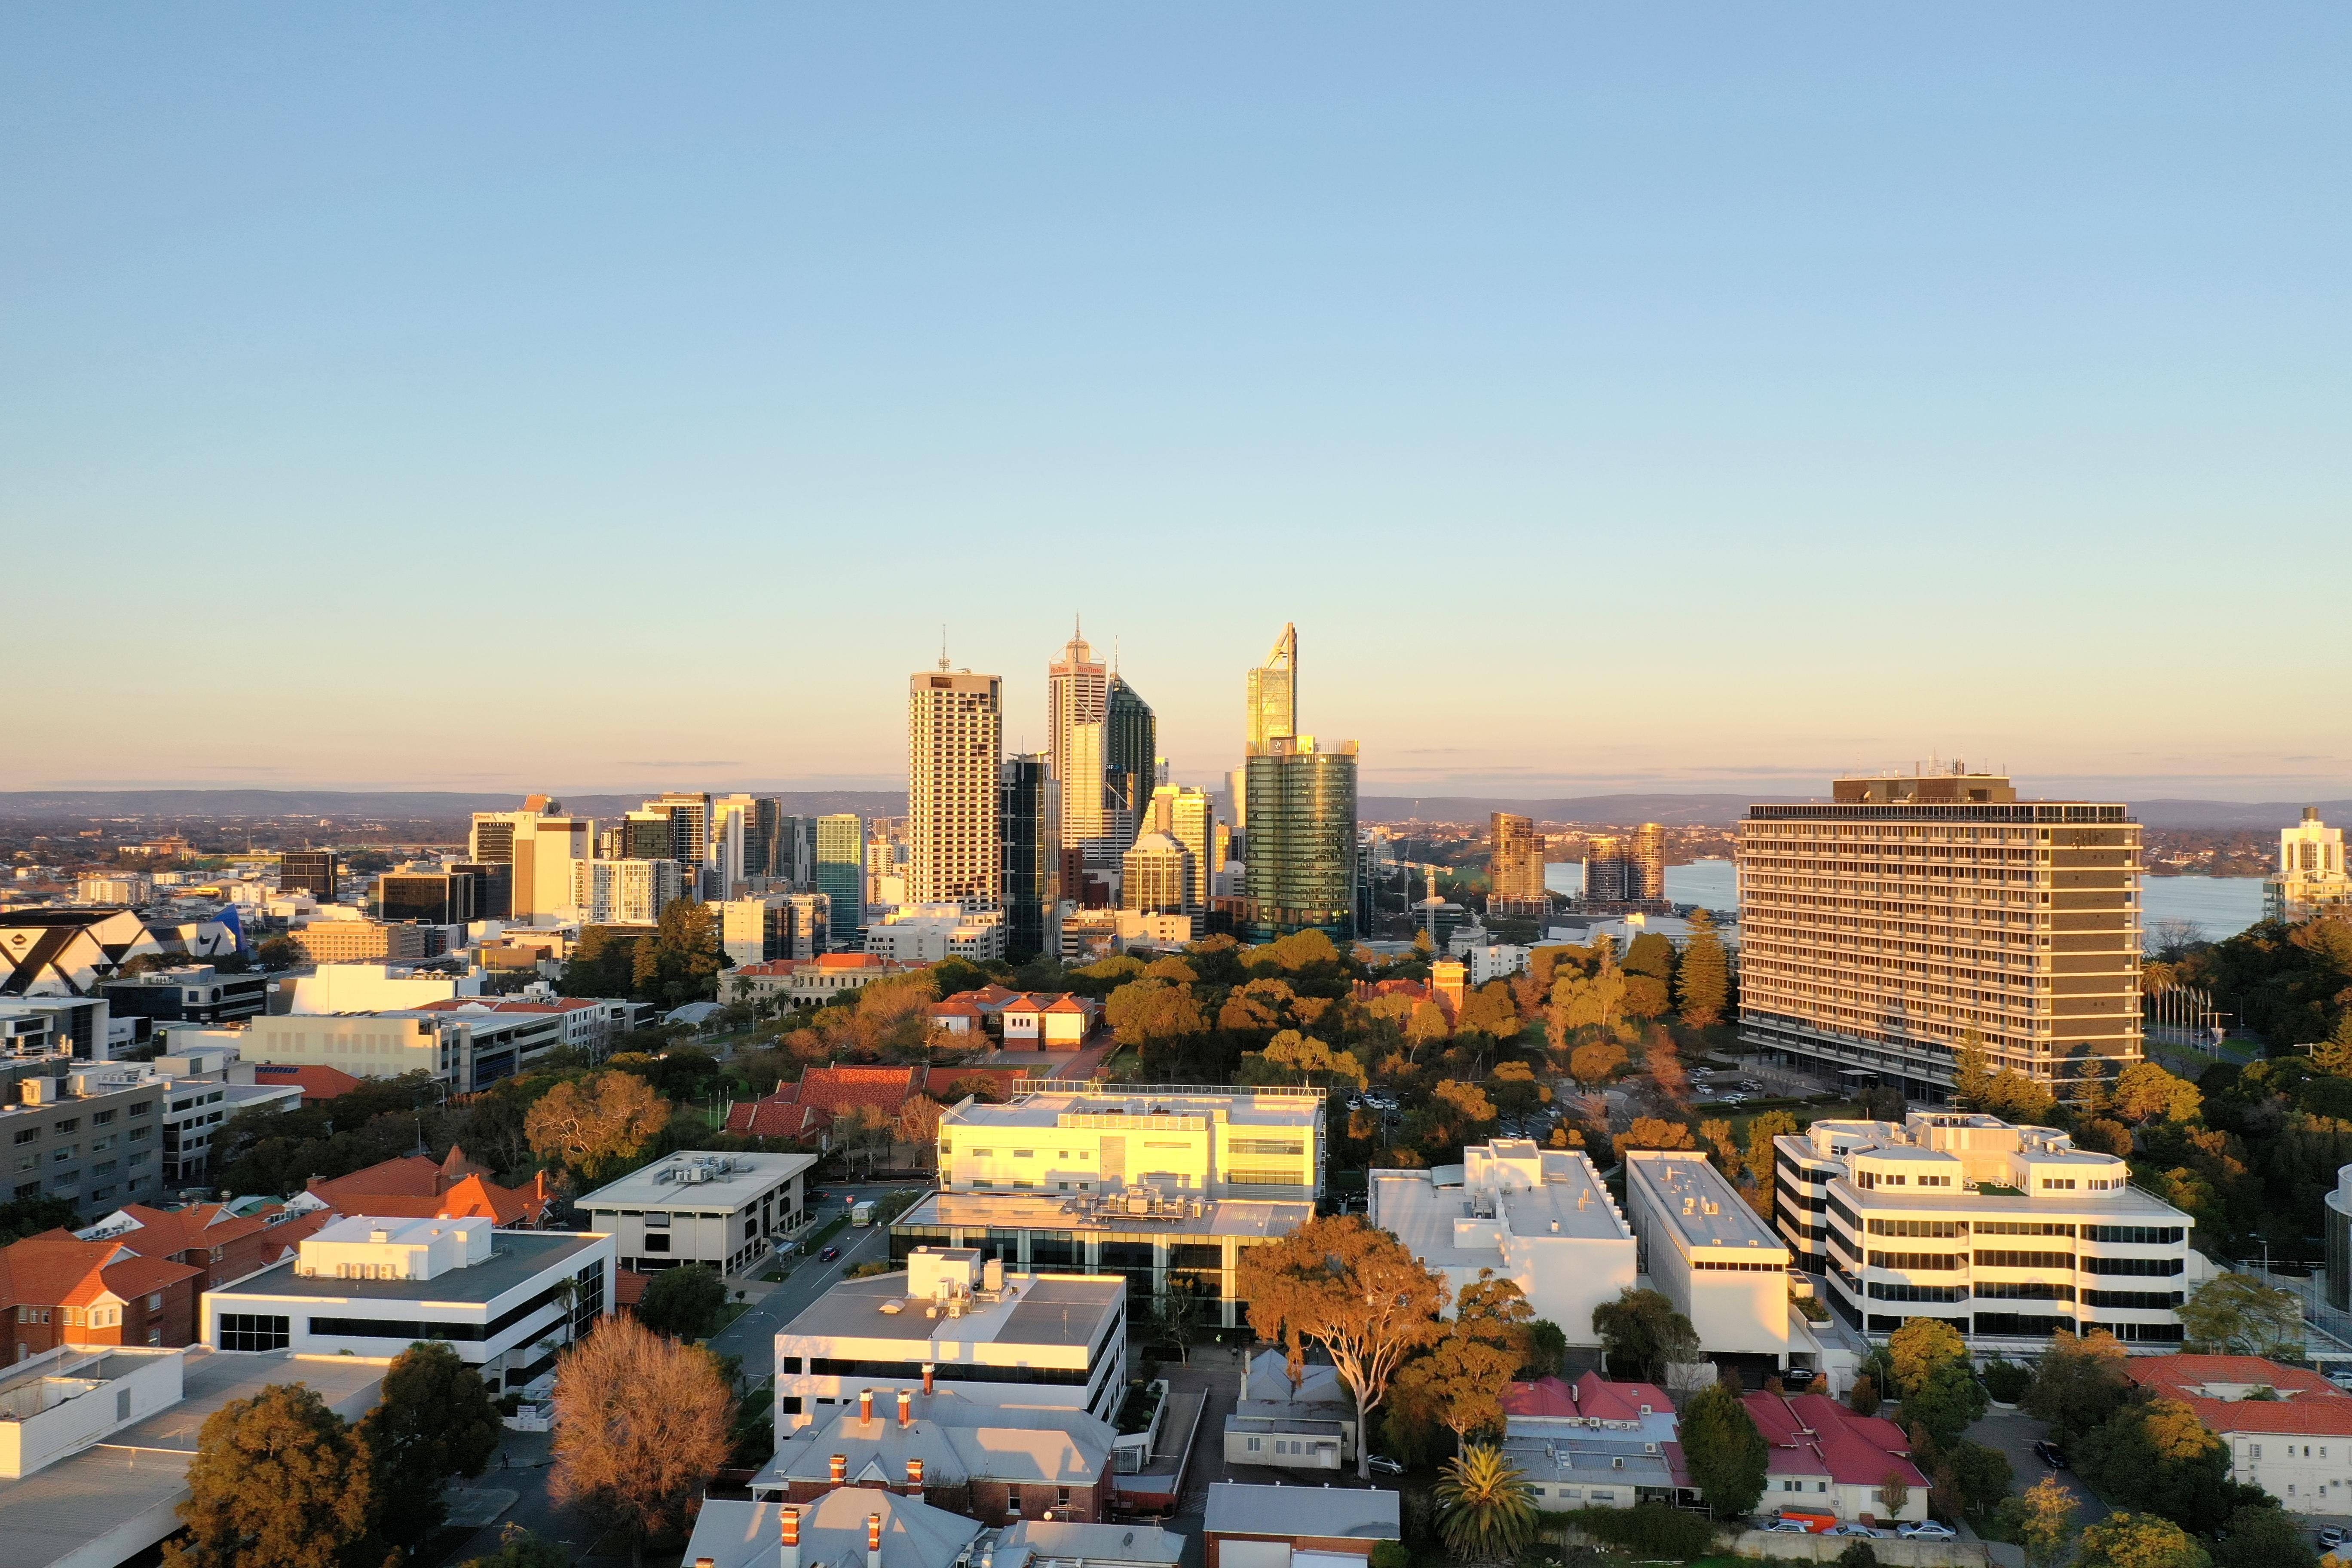 Drone Image Western Australia 360 Panorama VR Property Visualisation